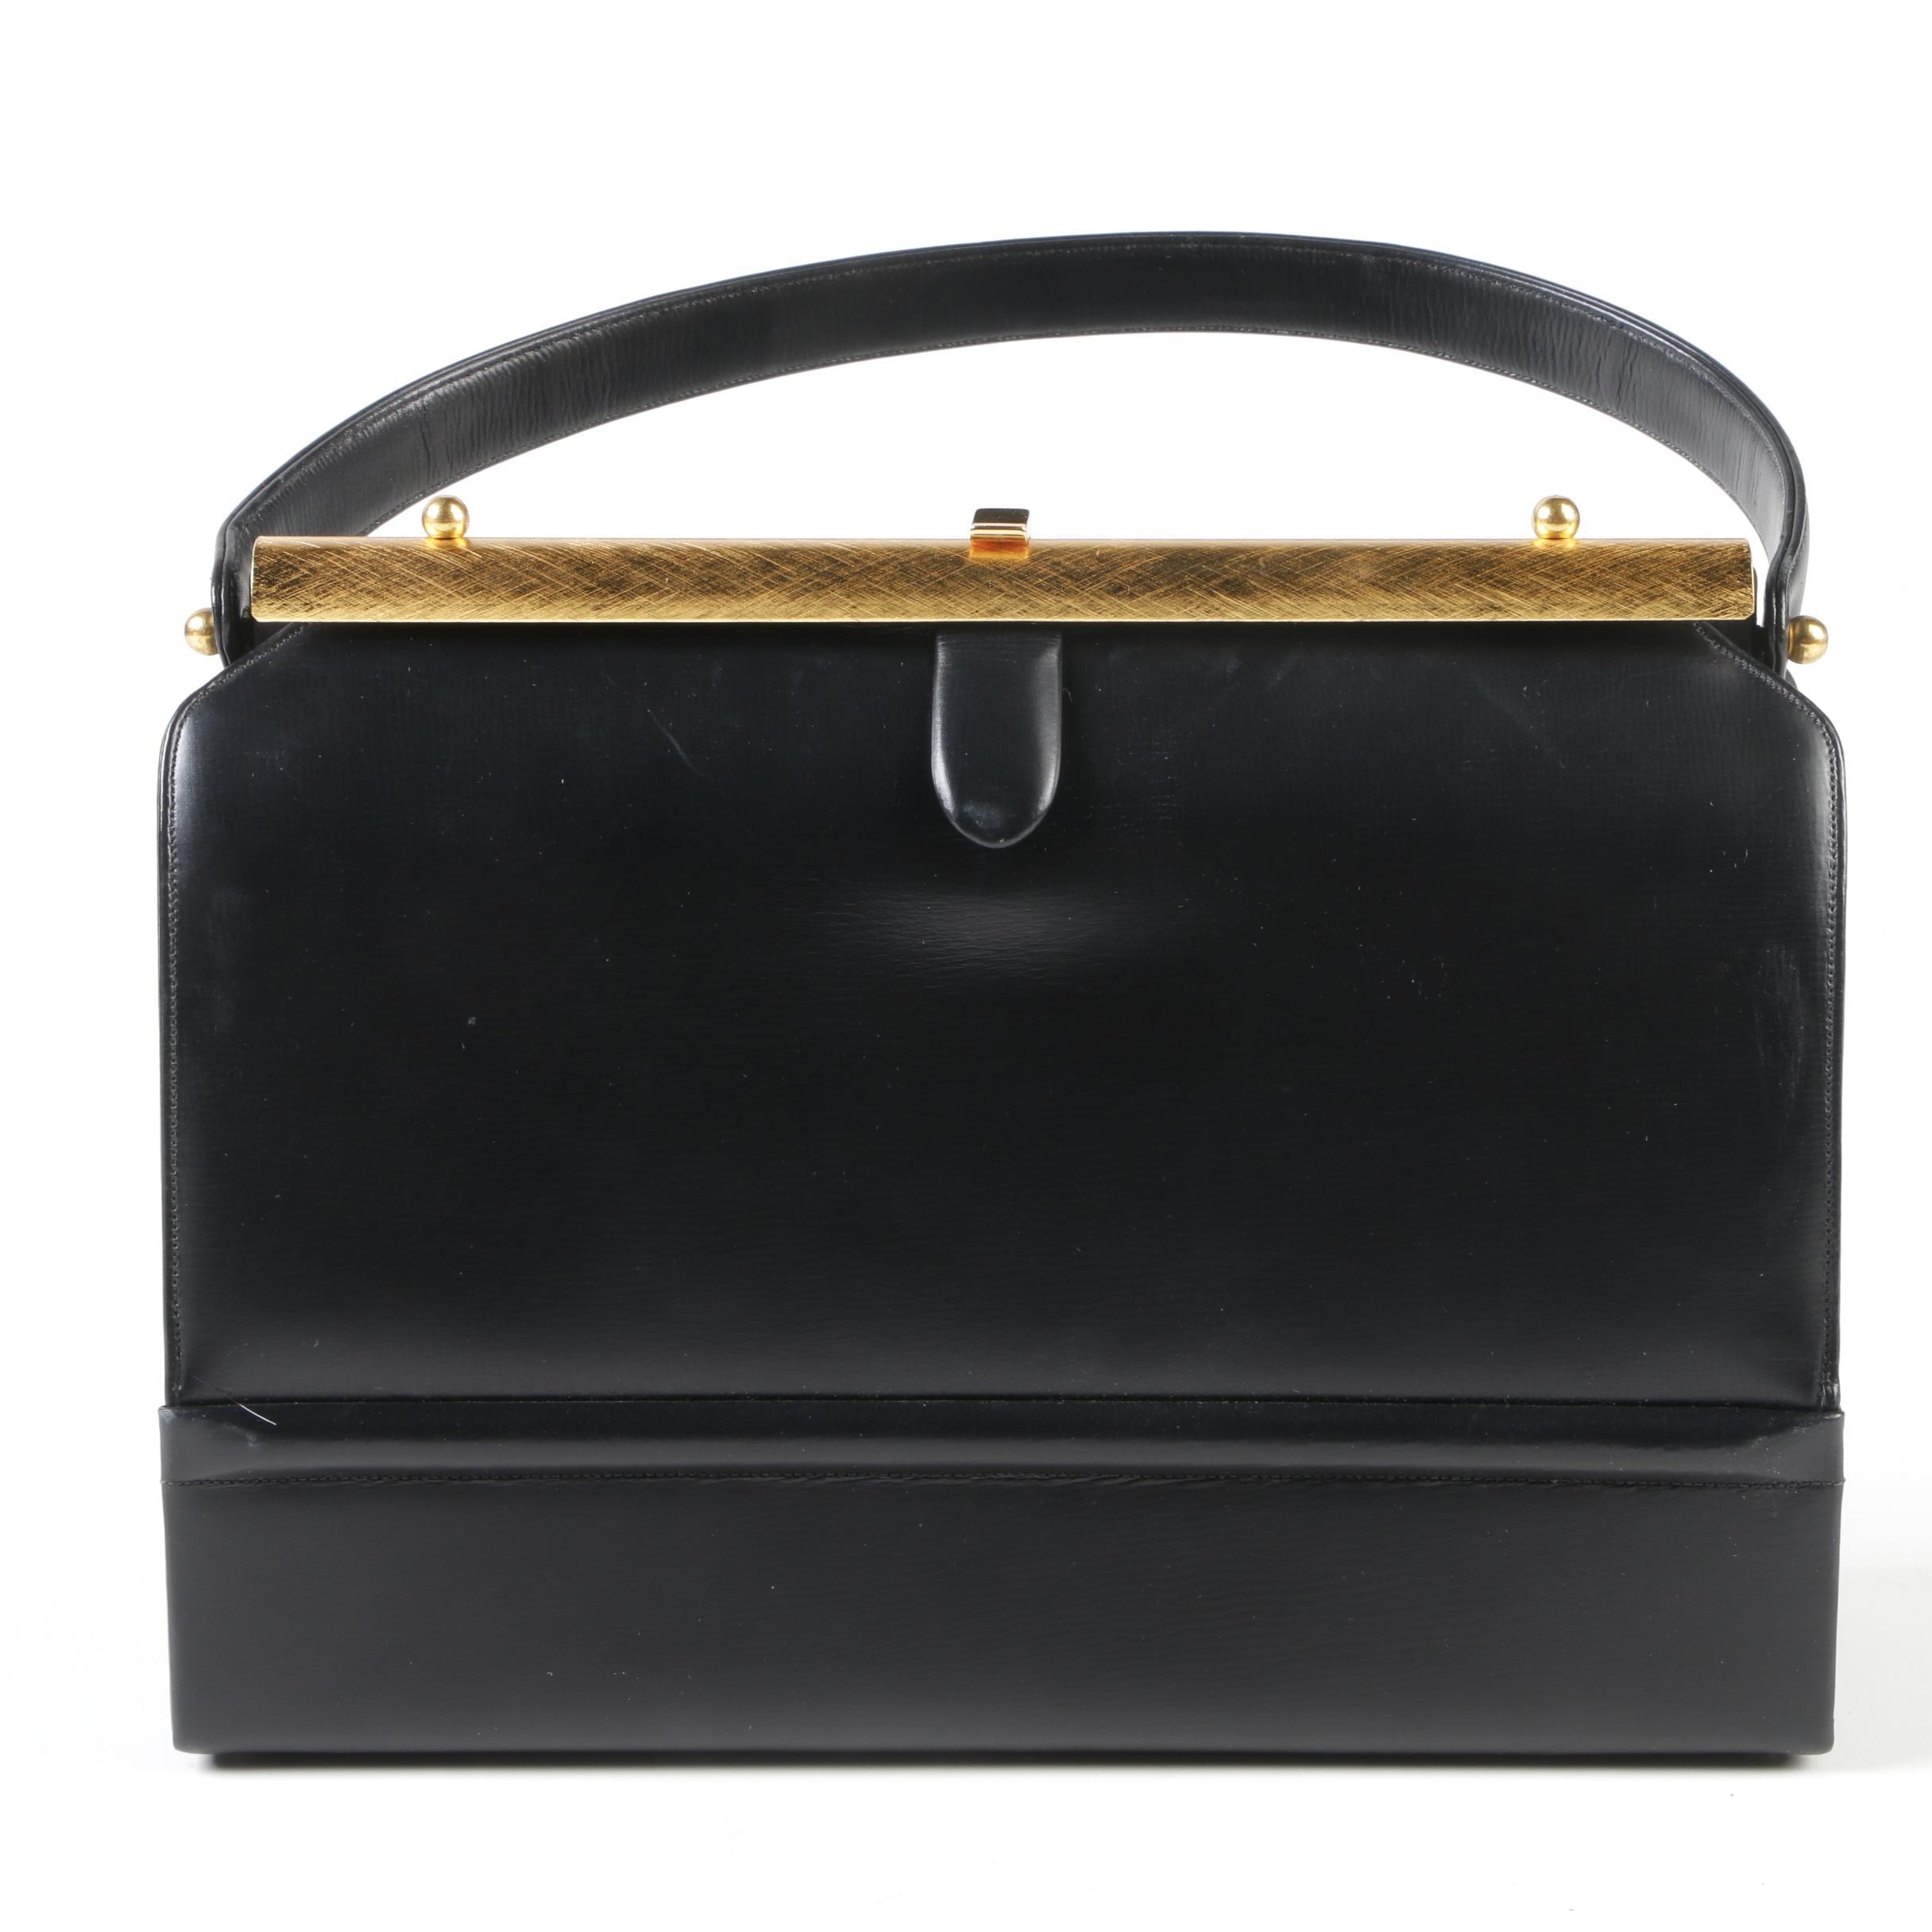 Prestige Black and Red Leather Handbag with Gold Tone Bar Closure, 1960s Vintage